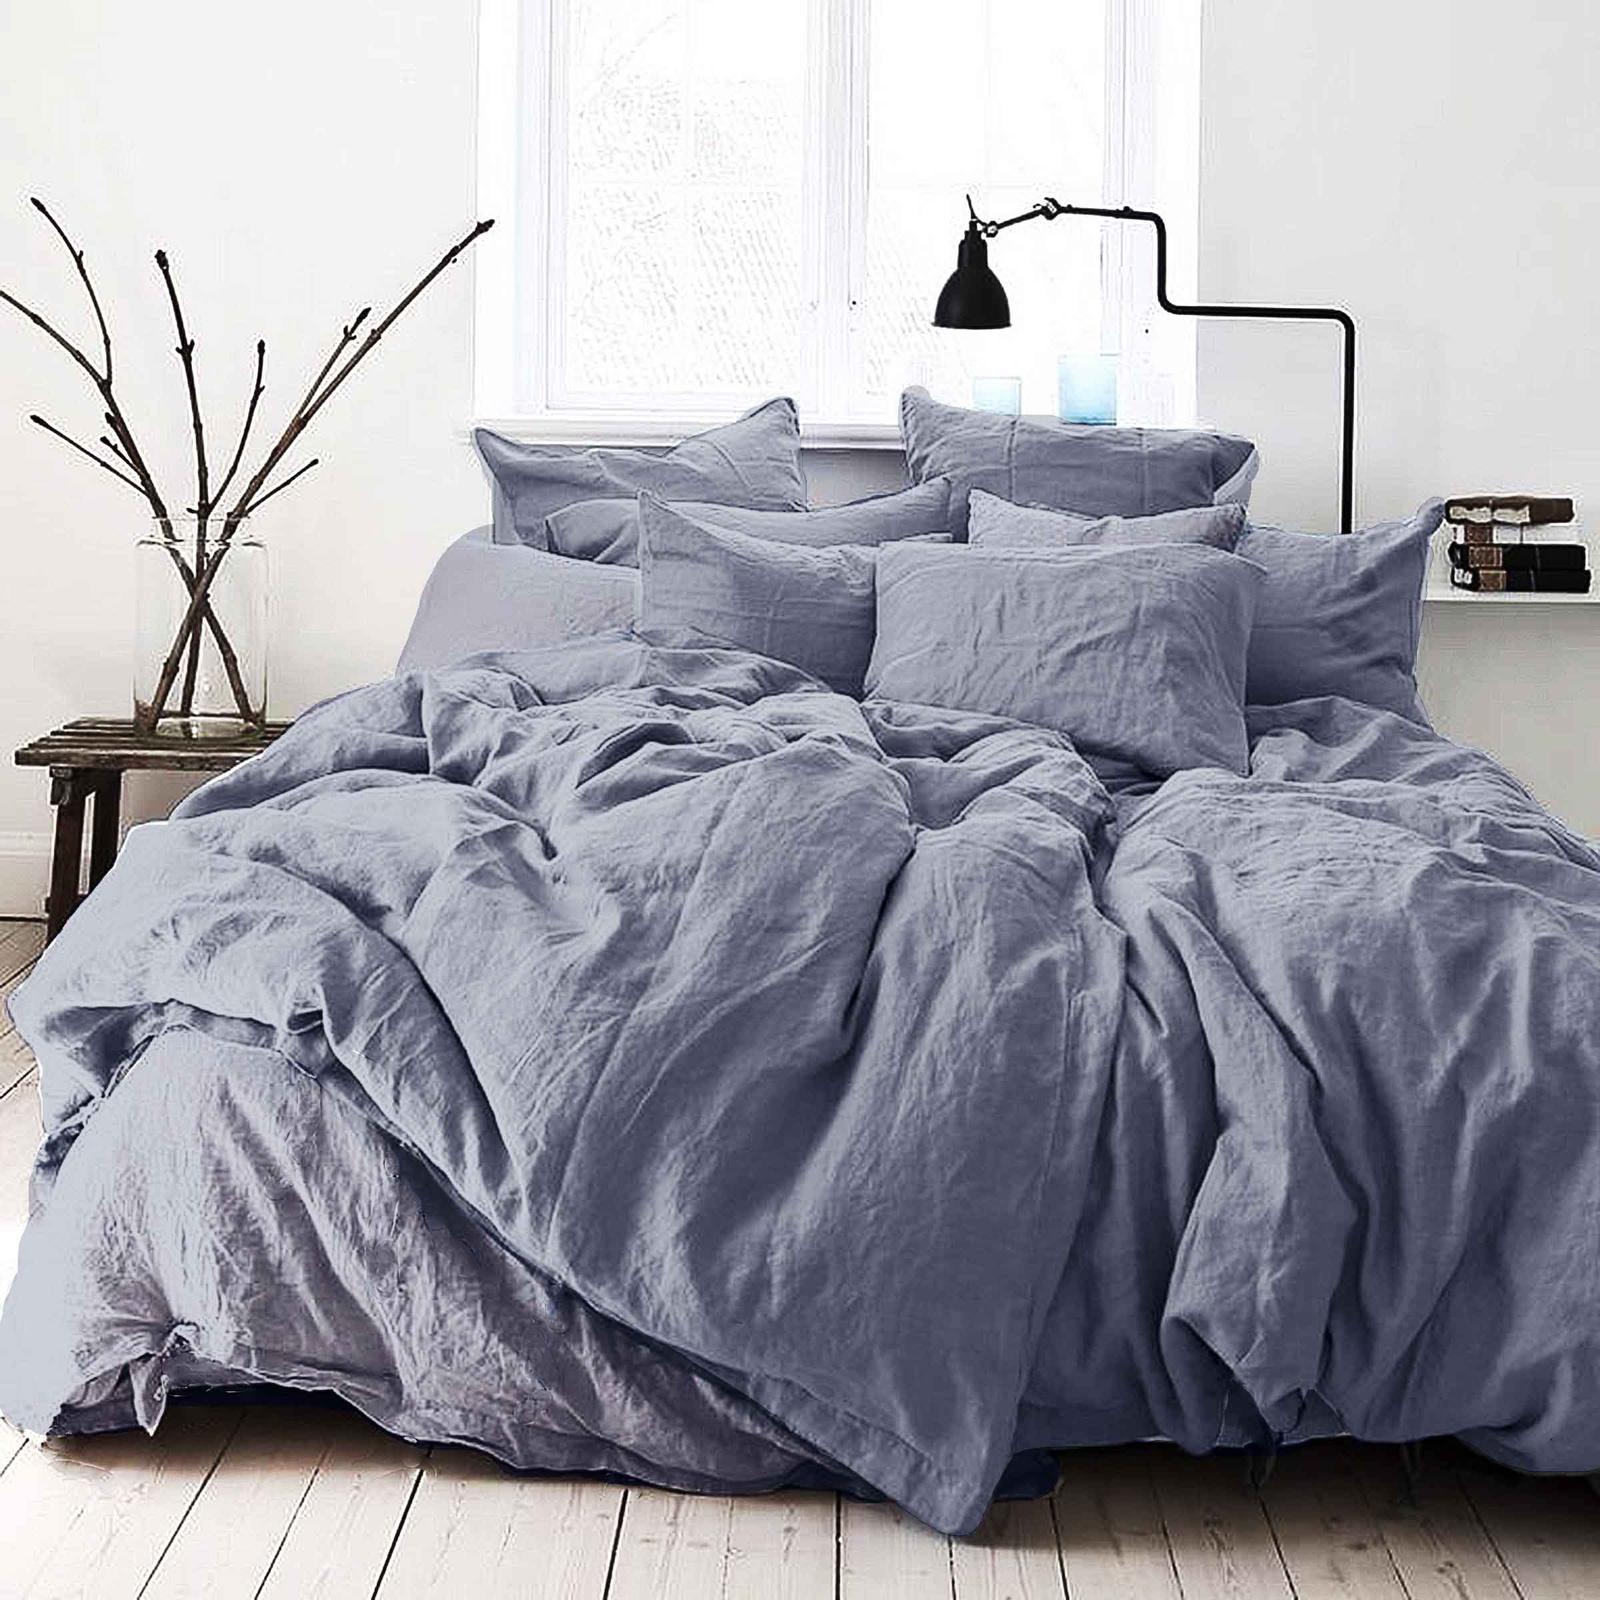 цена Комплект постельного белья Seta Лён De Lux Dark Blue 01783305, евро, наволочки 50x50 см онлайн в 2017 году